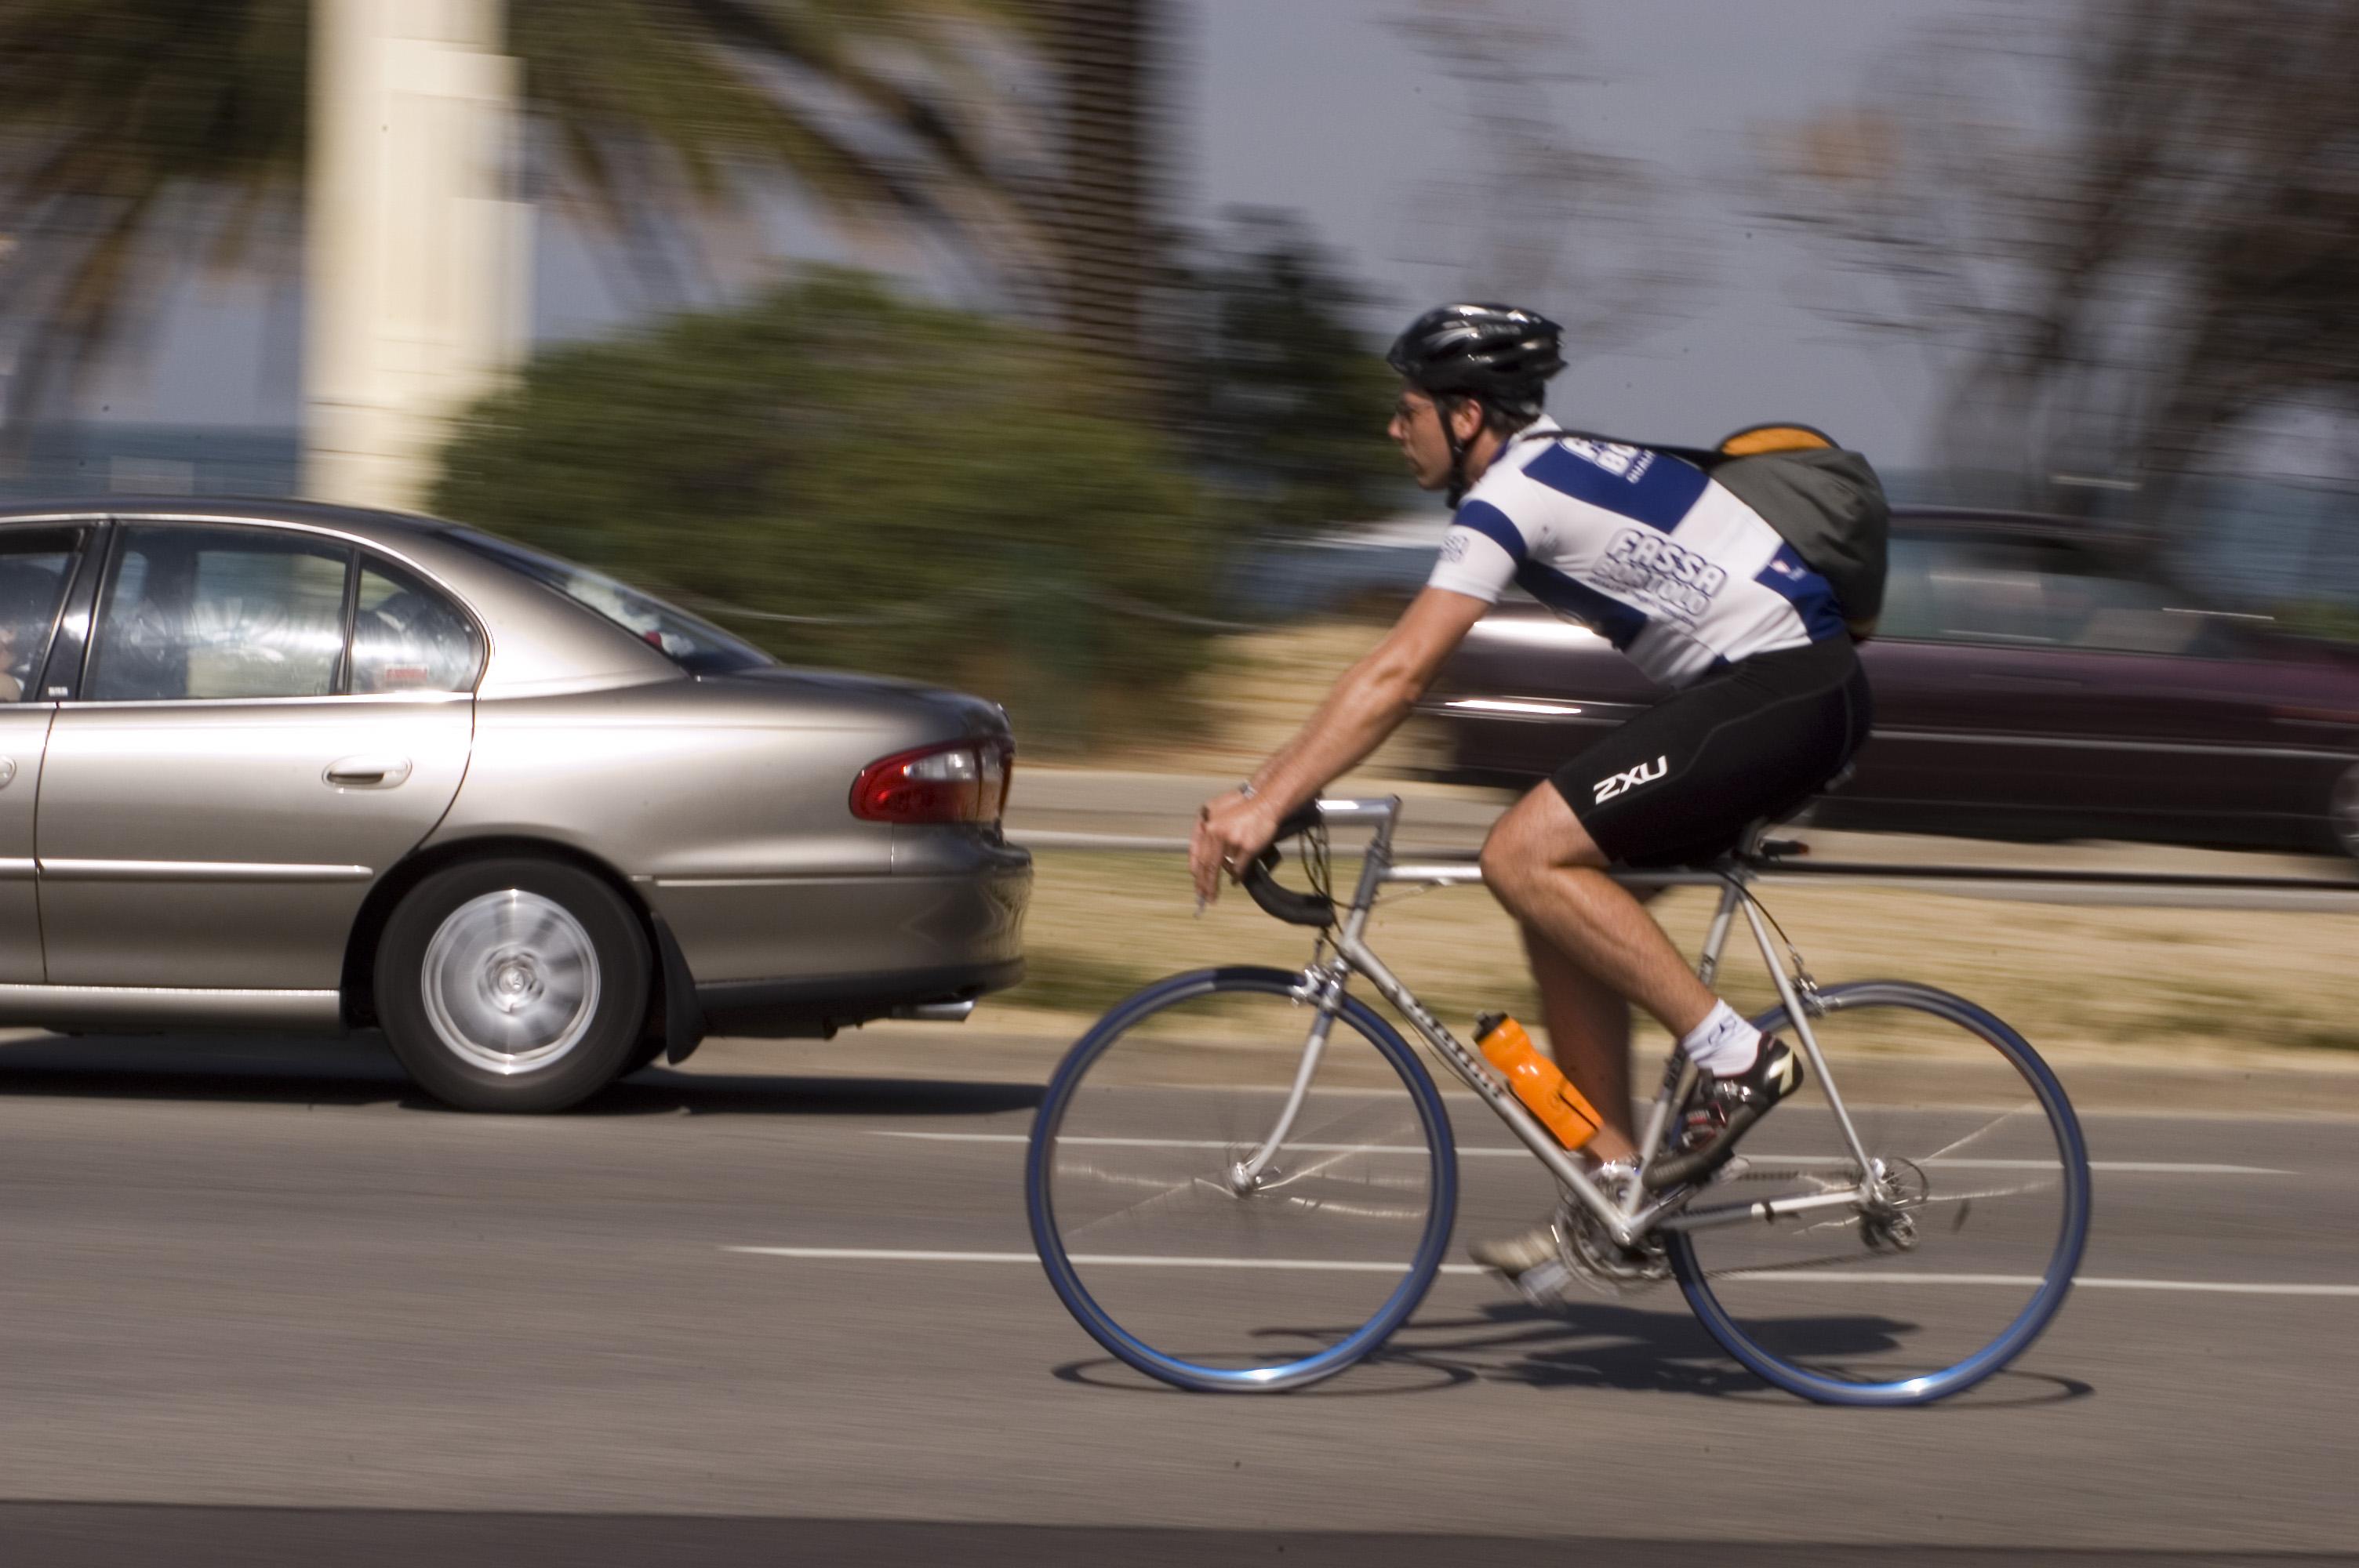 Does anyone have bicycle crash statistics?